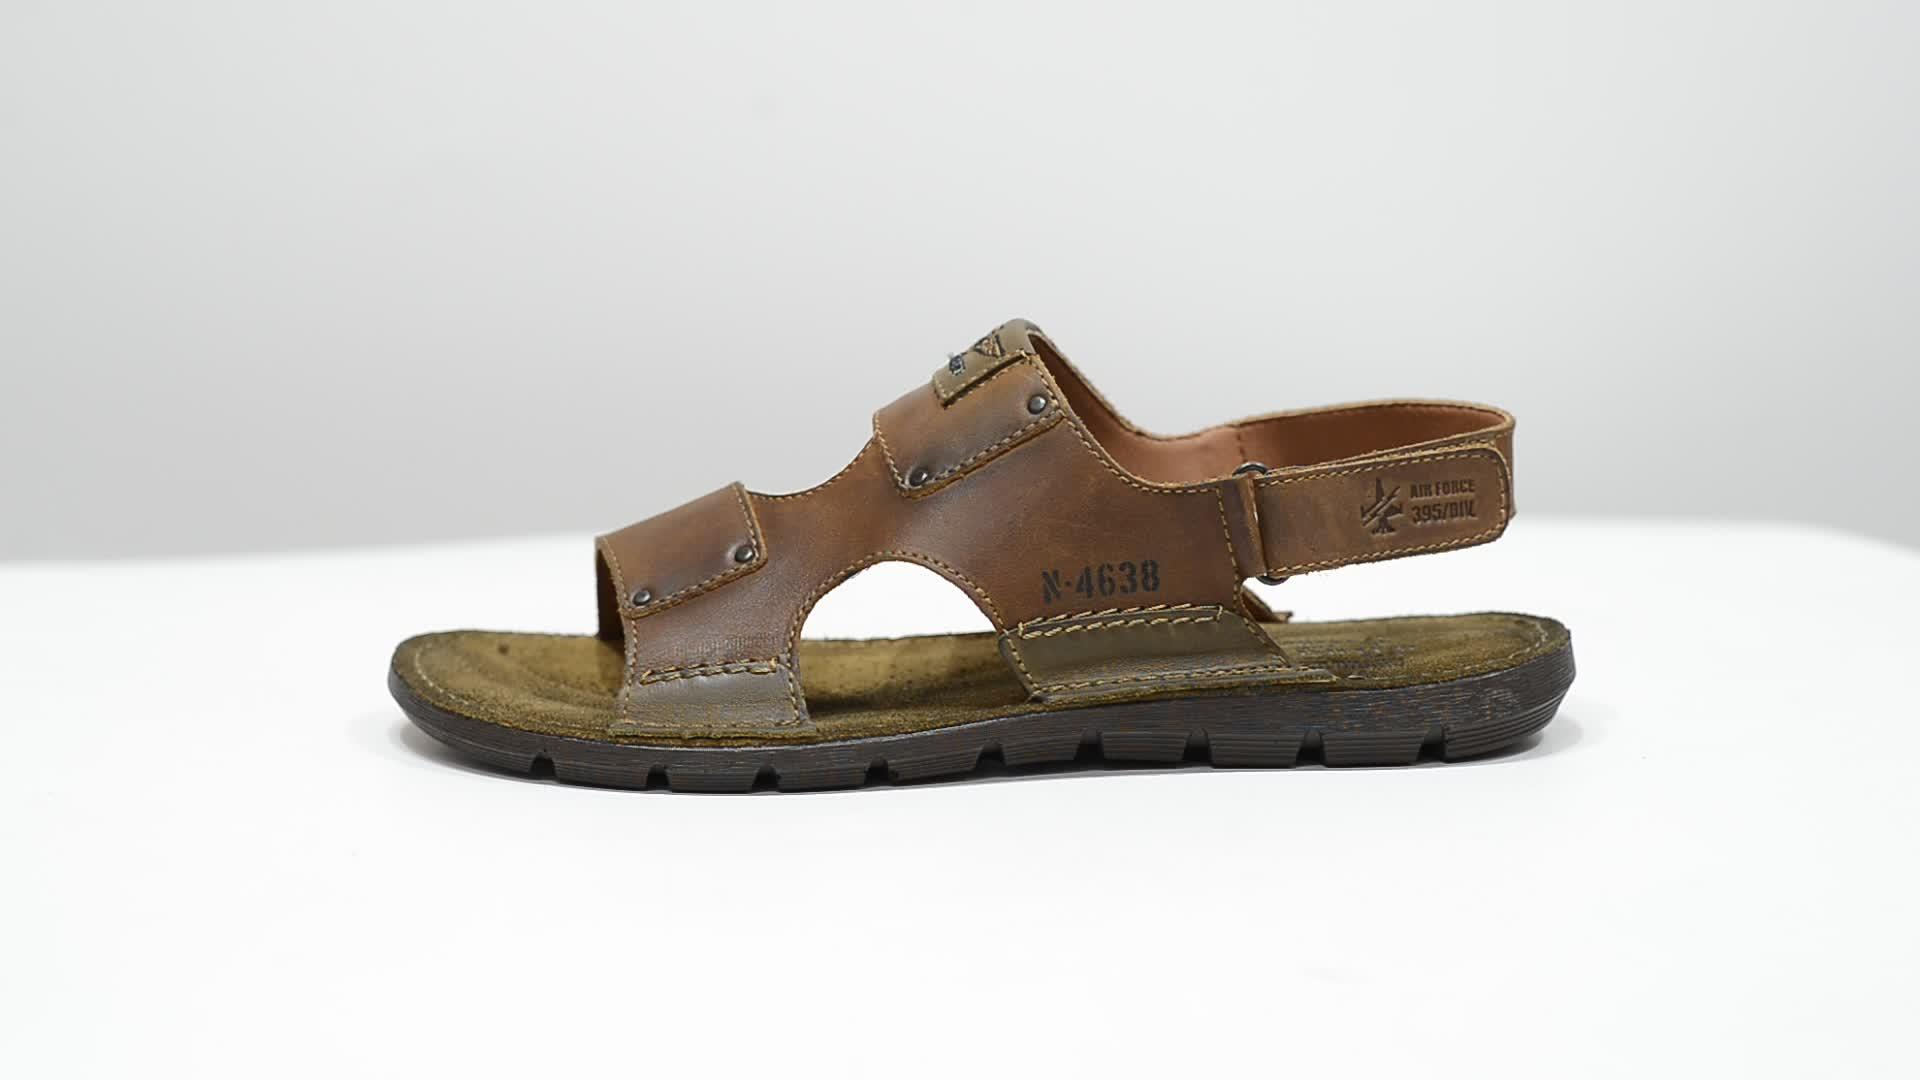 High quality mens genuine leather sandals, L536lk